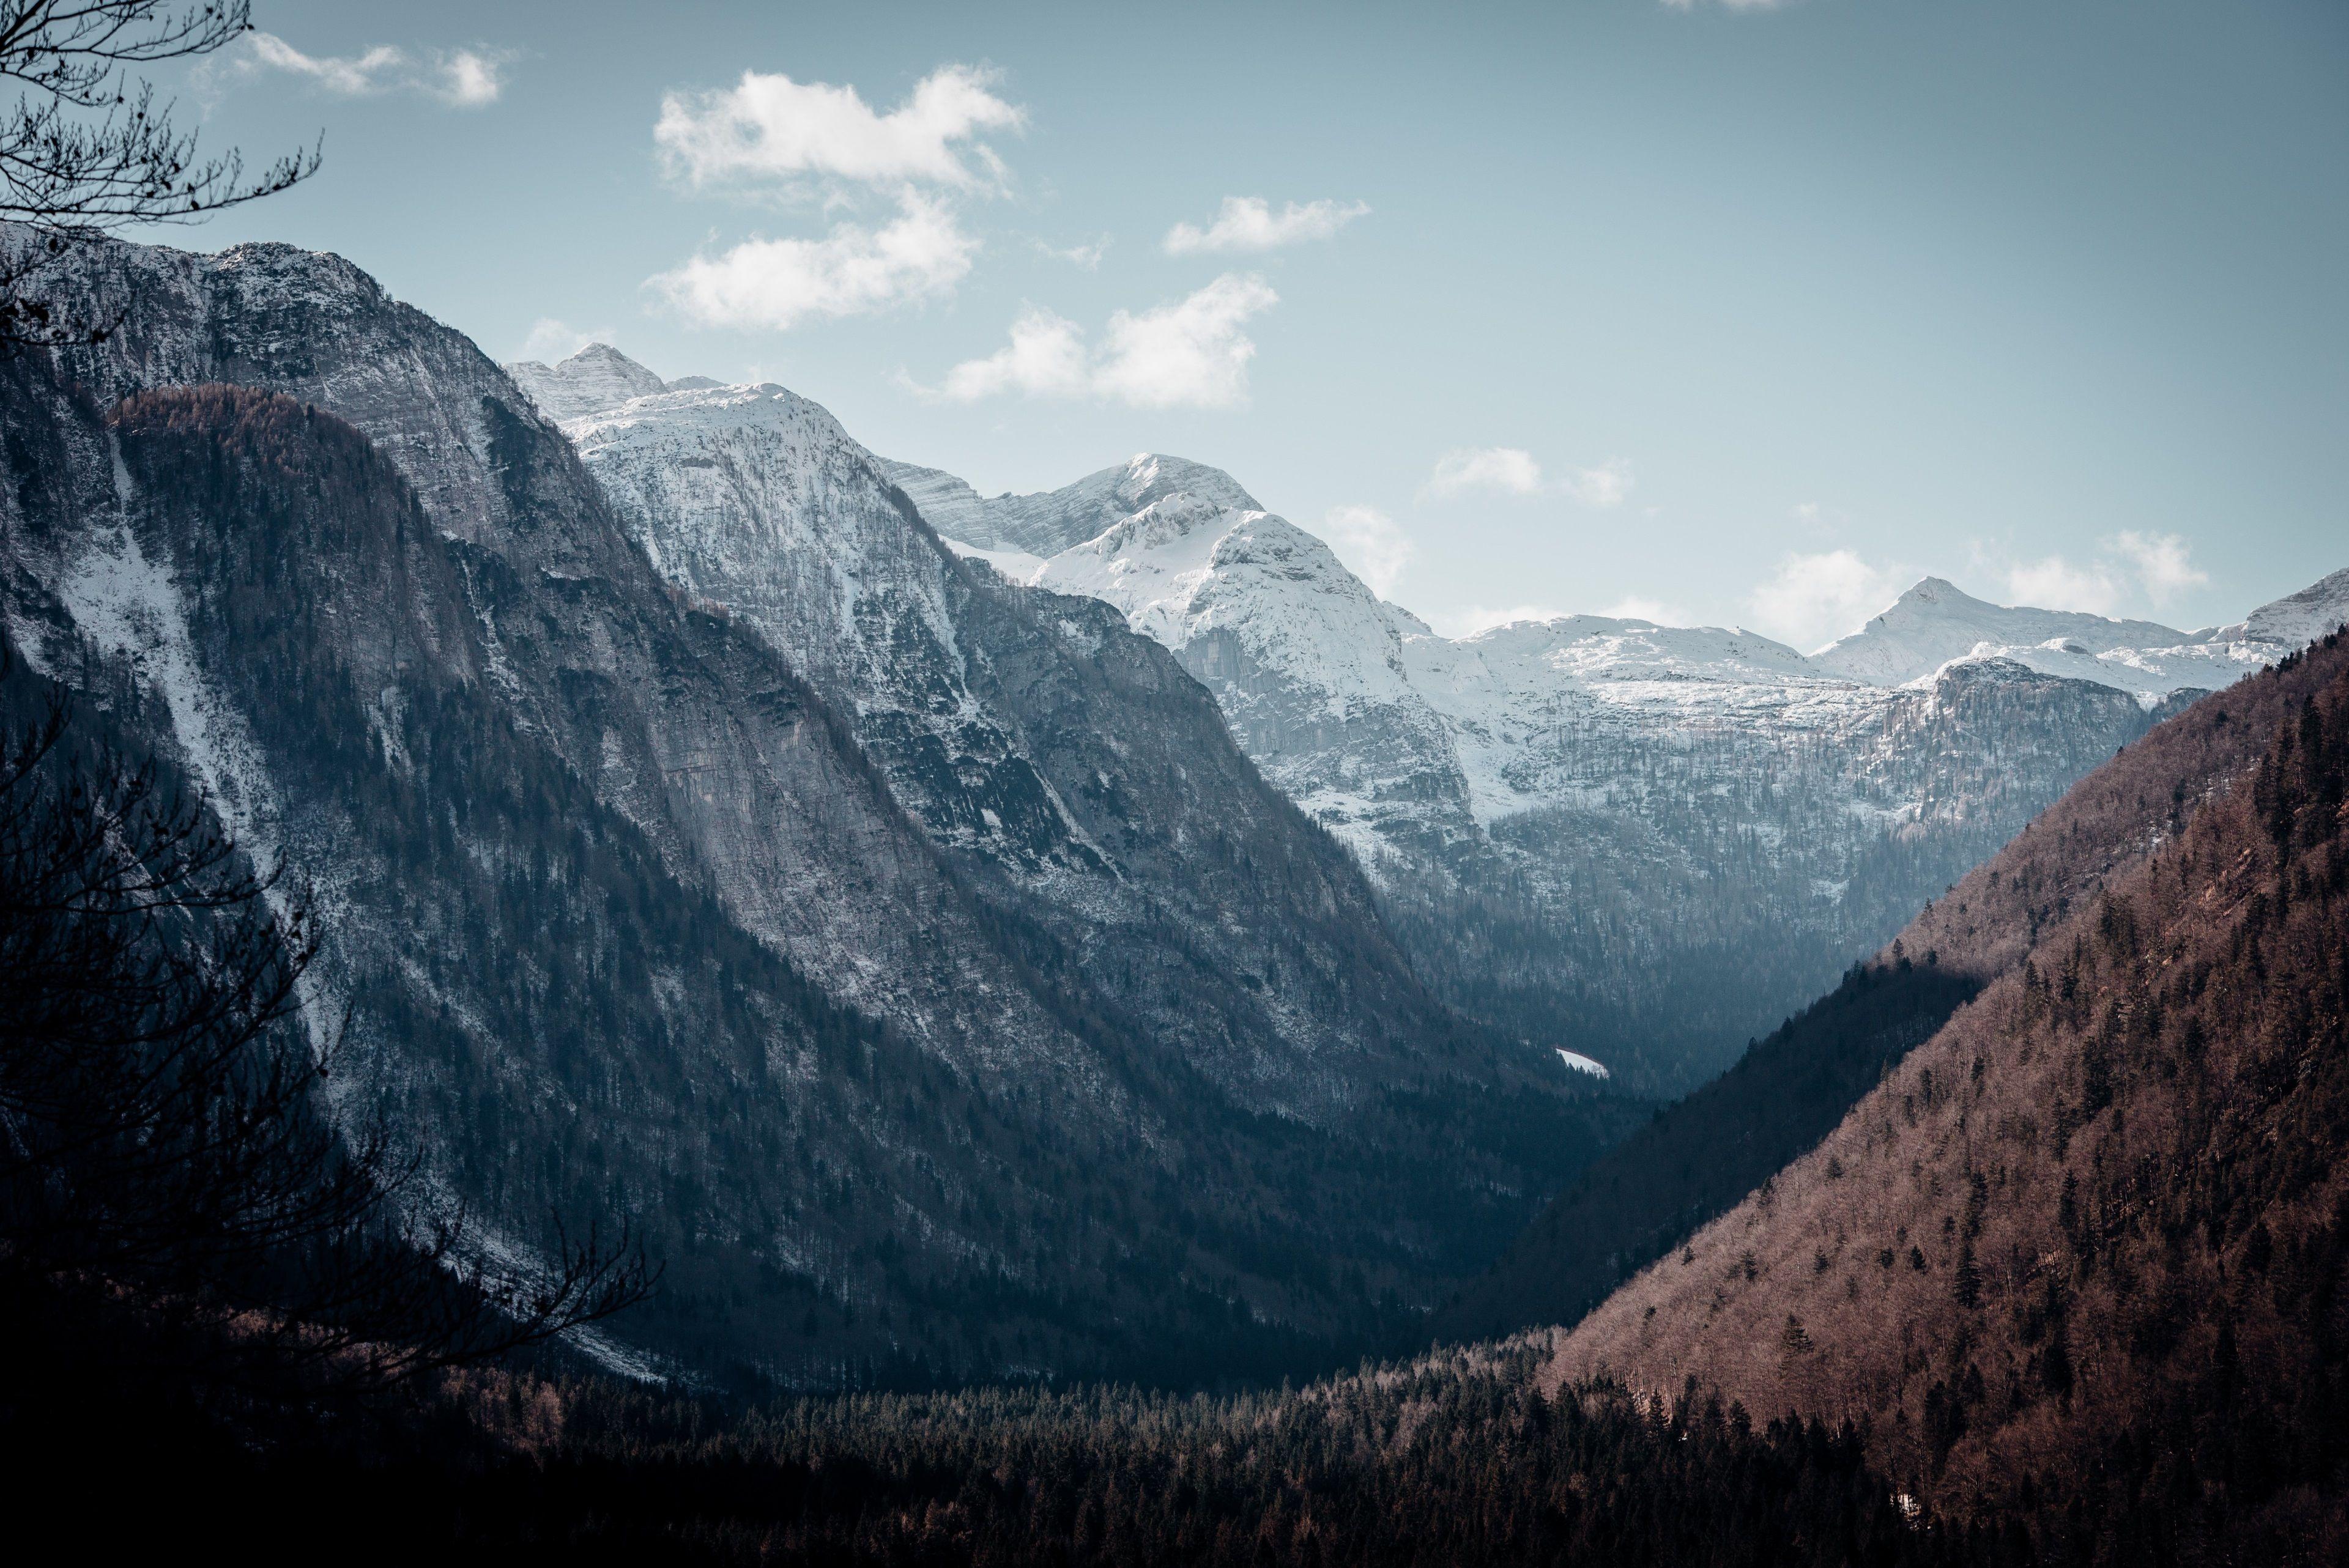 Free download 3840x2564 landscape 4k wallpaper download hd ...